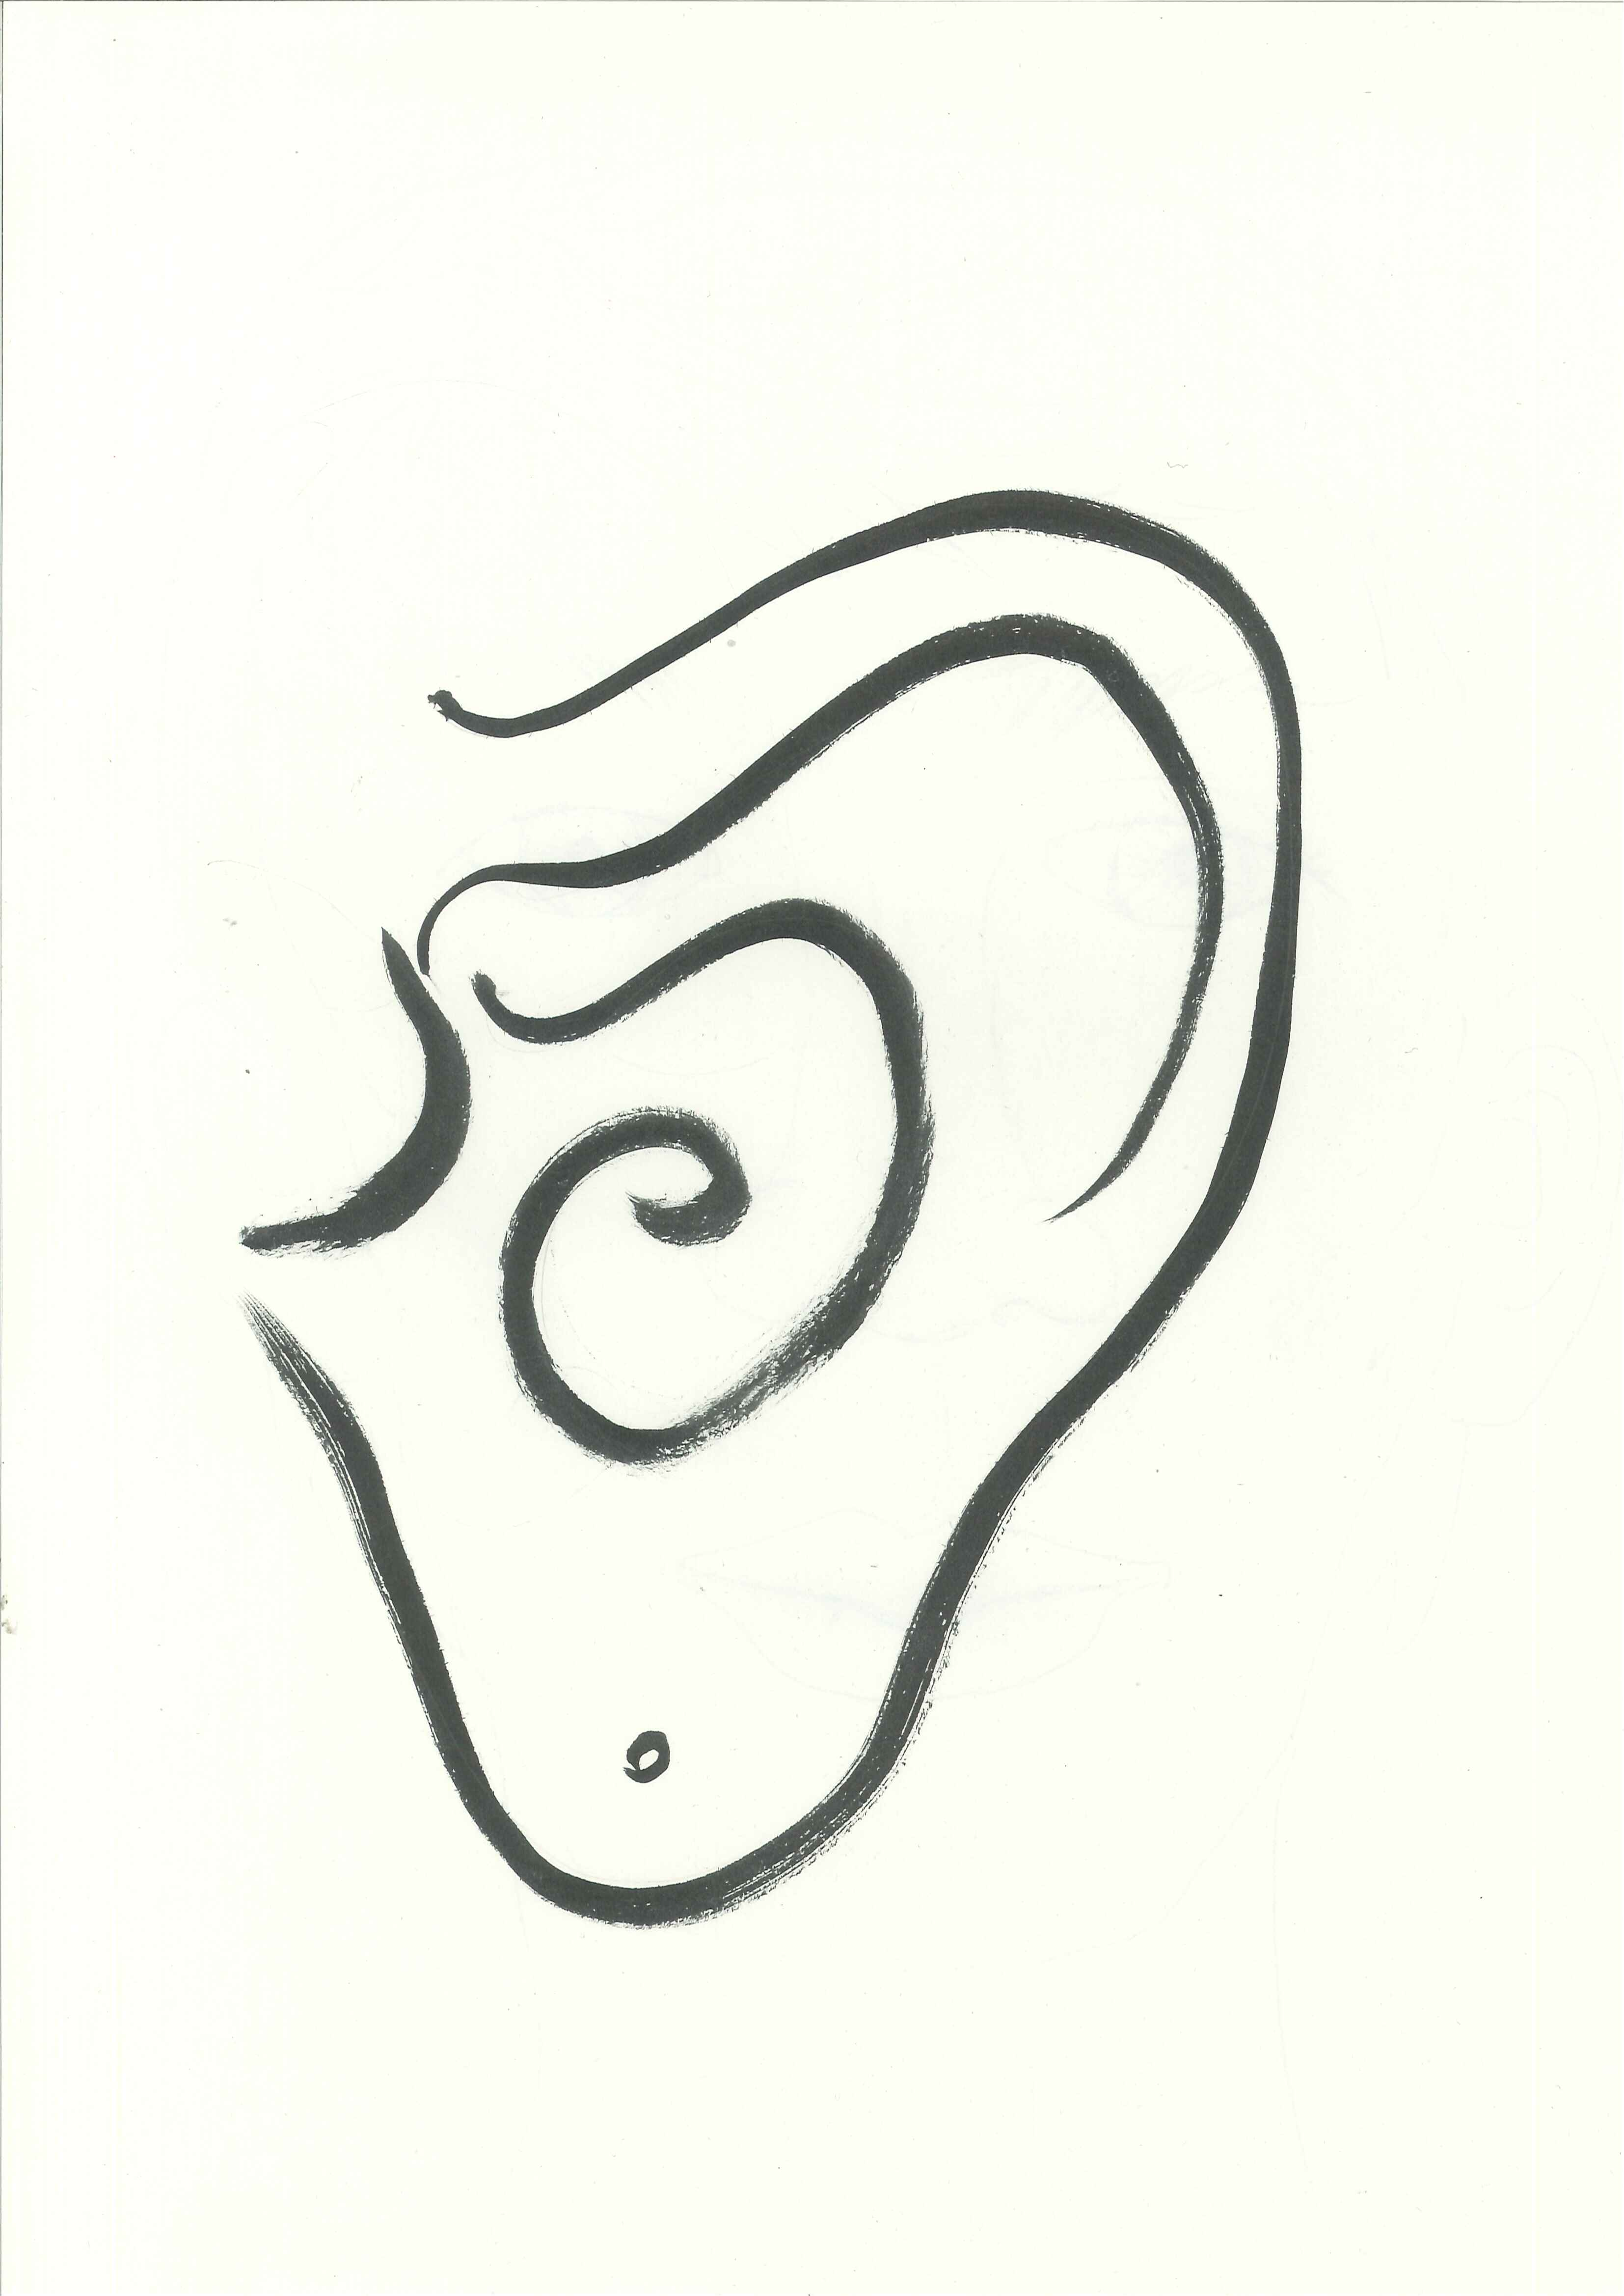 Clip Art Ears clipart  Ear Clip Art Images